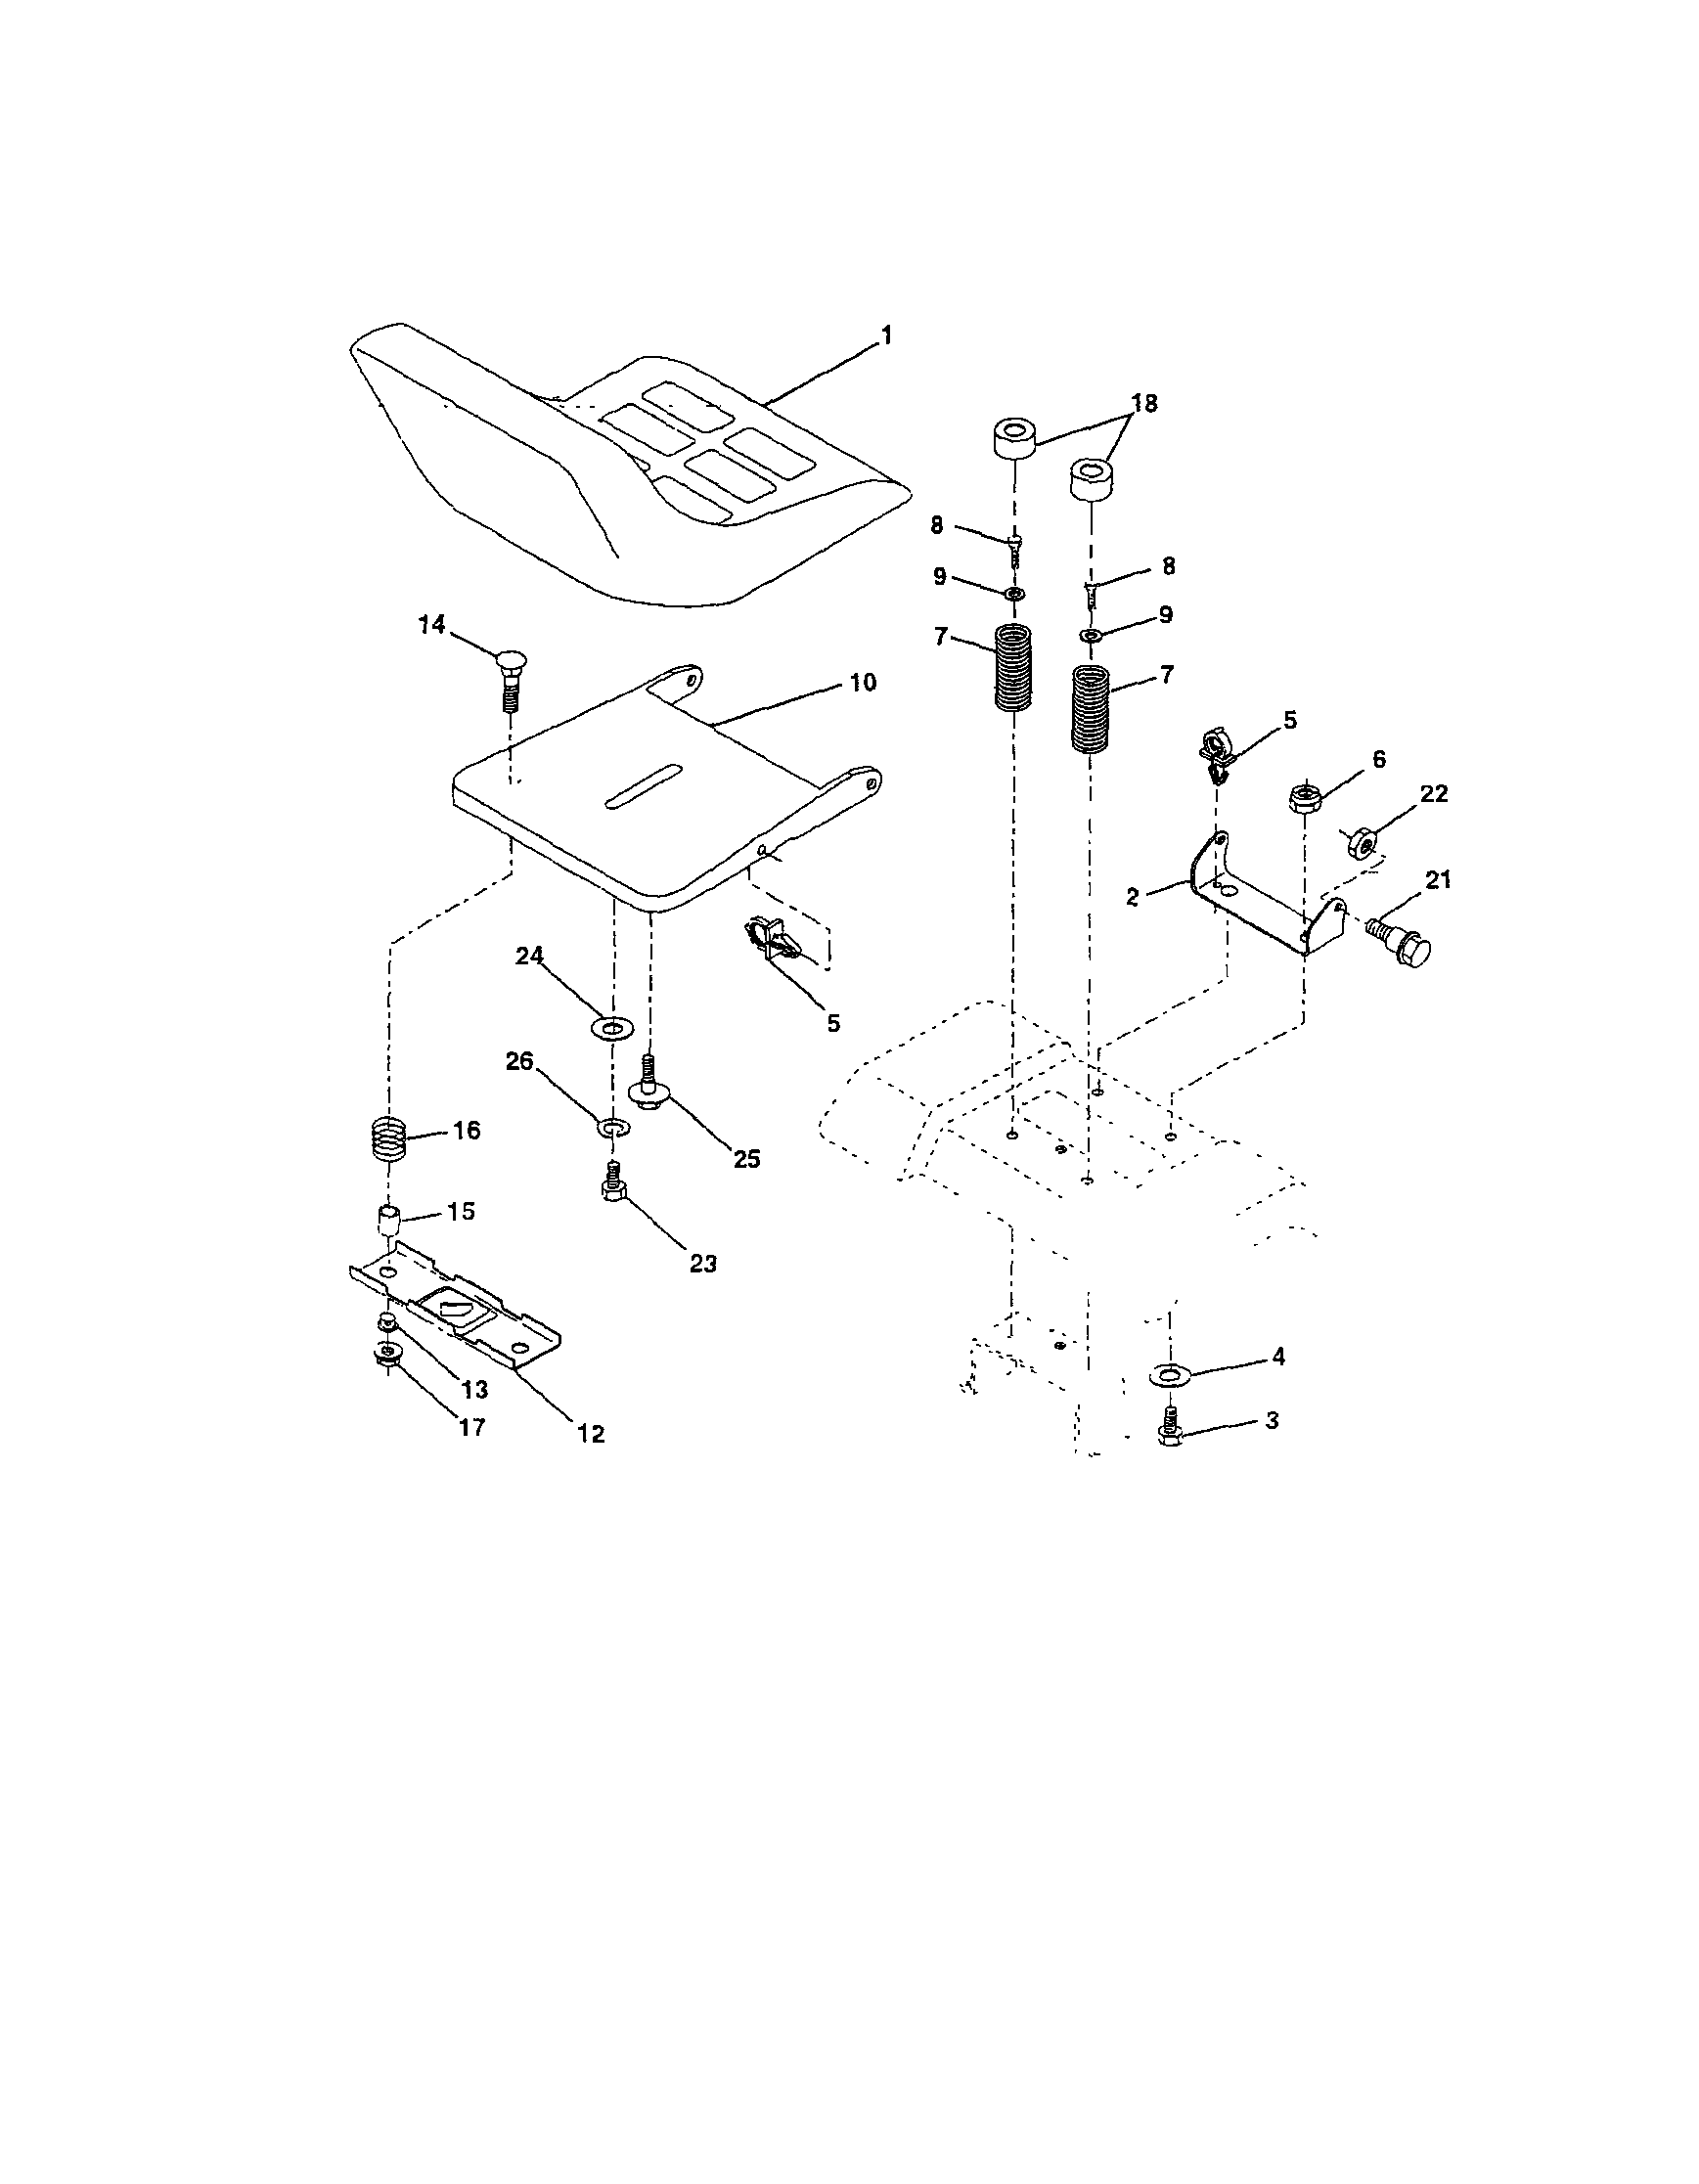 Husqvarna model yth180 lawn tractor genuine parts p0505127 00005 1509200html amana ap125hd wiring diagrams wiring amana ap125hd wiring diagrams wiring